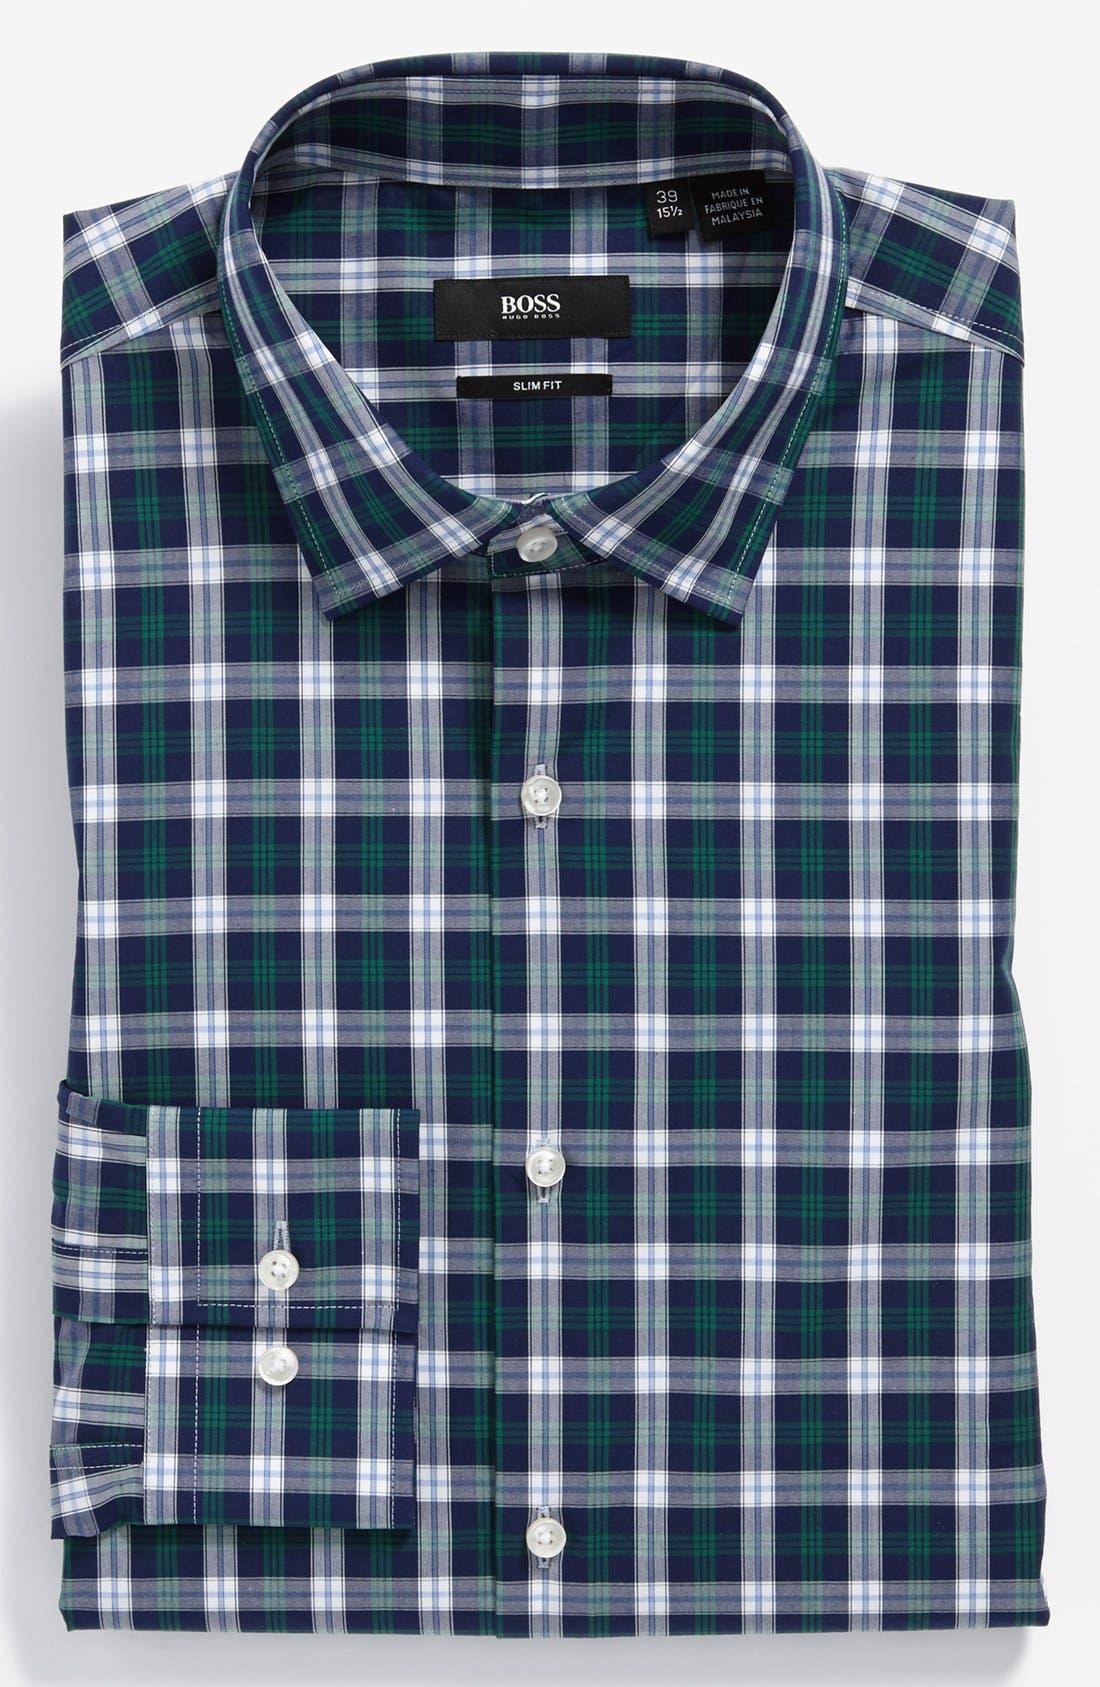 BOSS HUGO BOSS 'Jenno' Slim Fit Dress Shirt, Main, color, 312